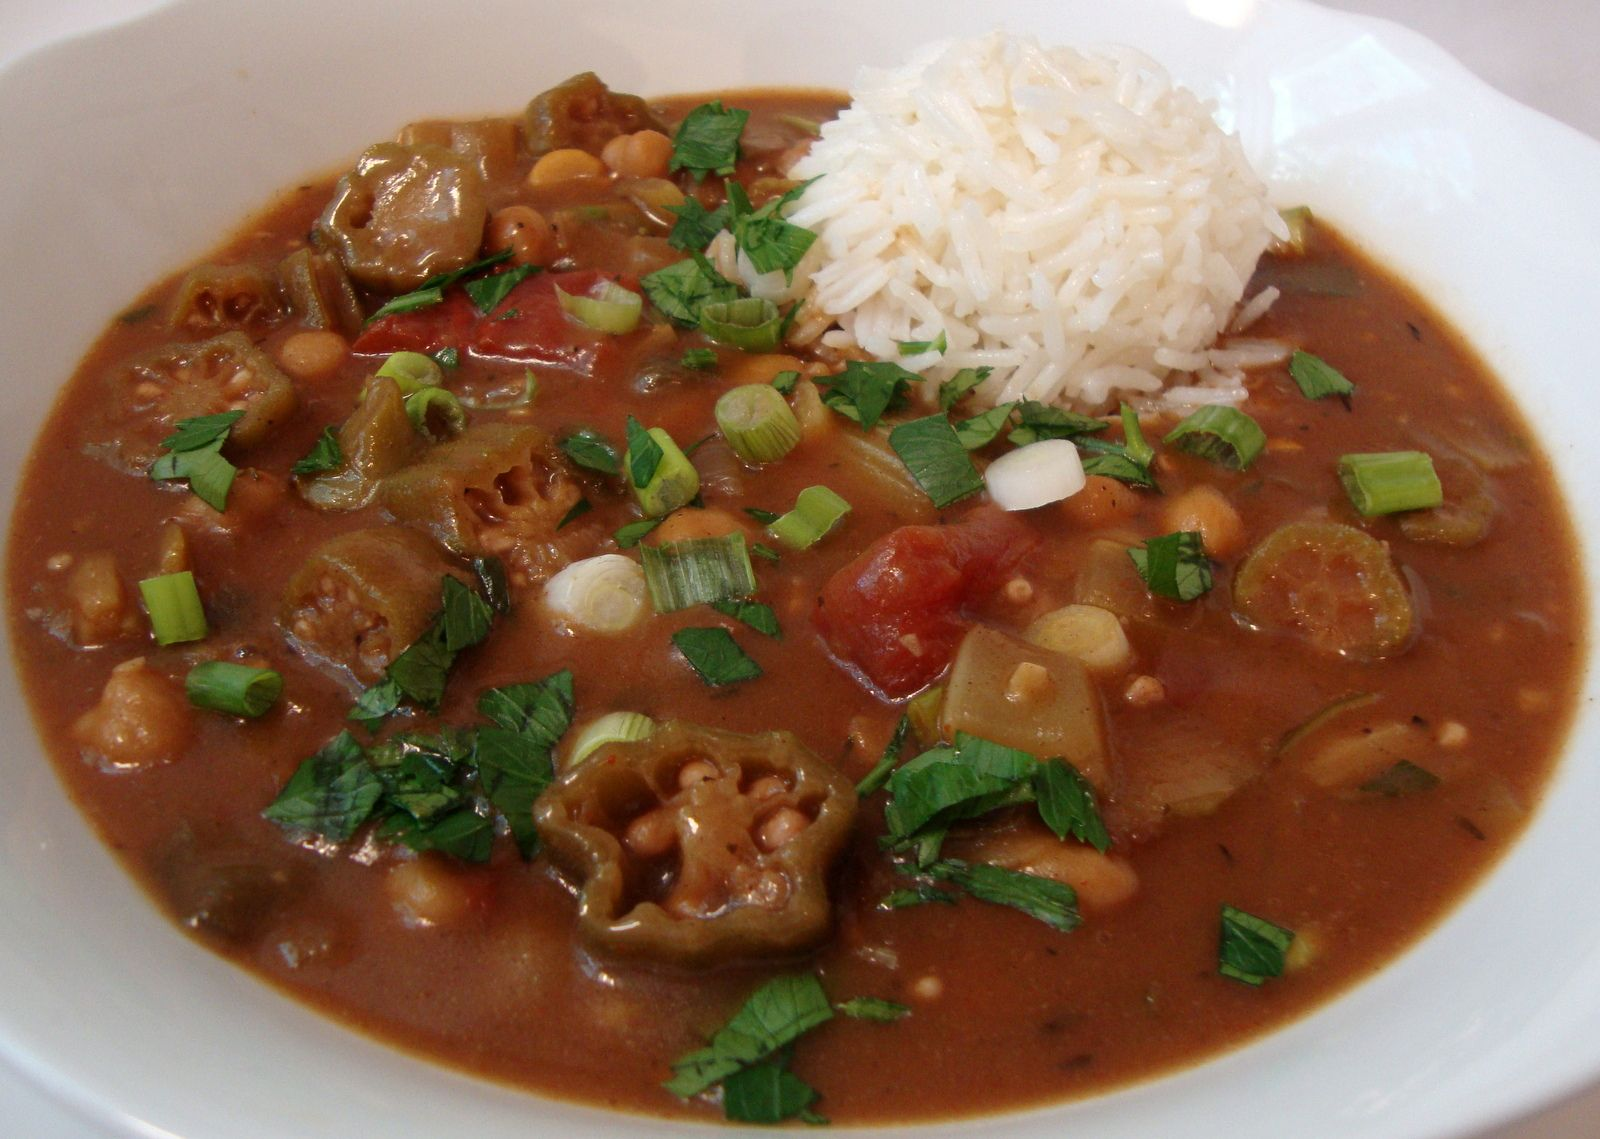 Vegan Chickpea Creole Gumbo from the Gentle Chef